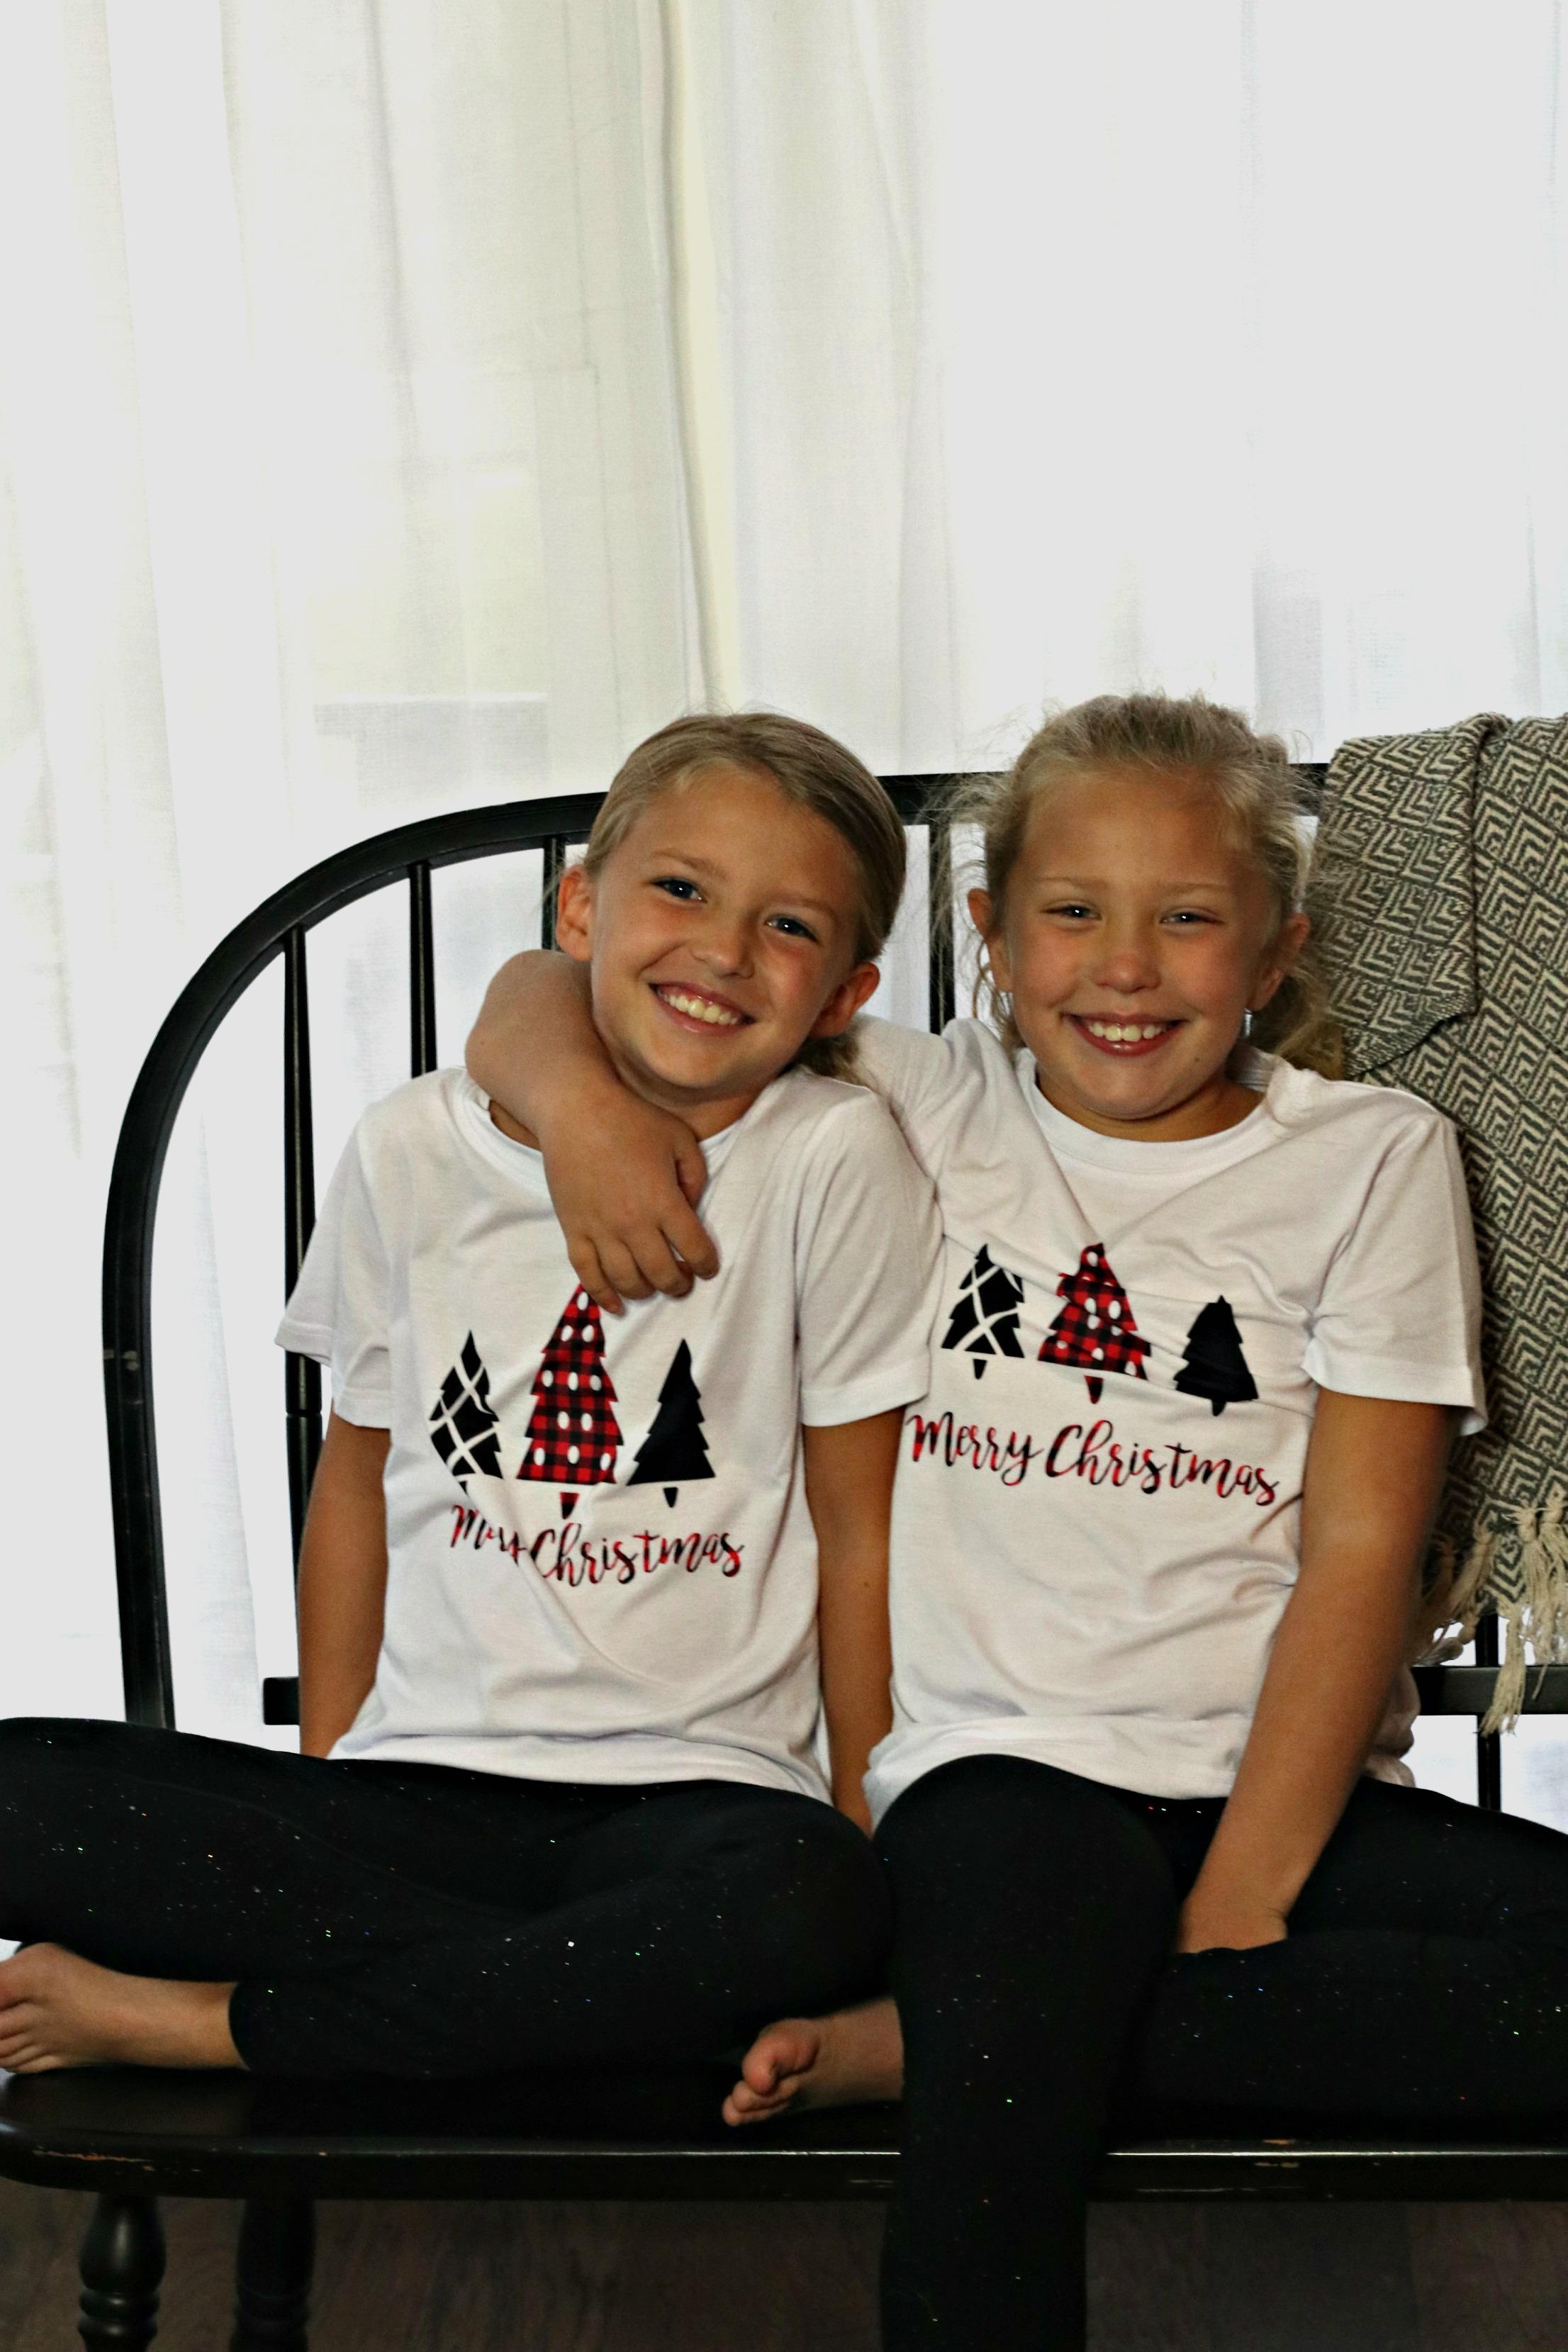 Diy Christmas Pajamas : christmas, pajamas, Plaid, Christmas, Pajamas, Family, Cricut, Maker, Infusible, Houston, Mommy, Lifestyle, Blogger, Without, Answers